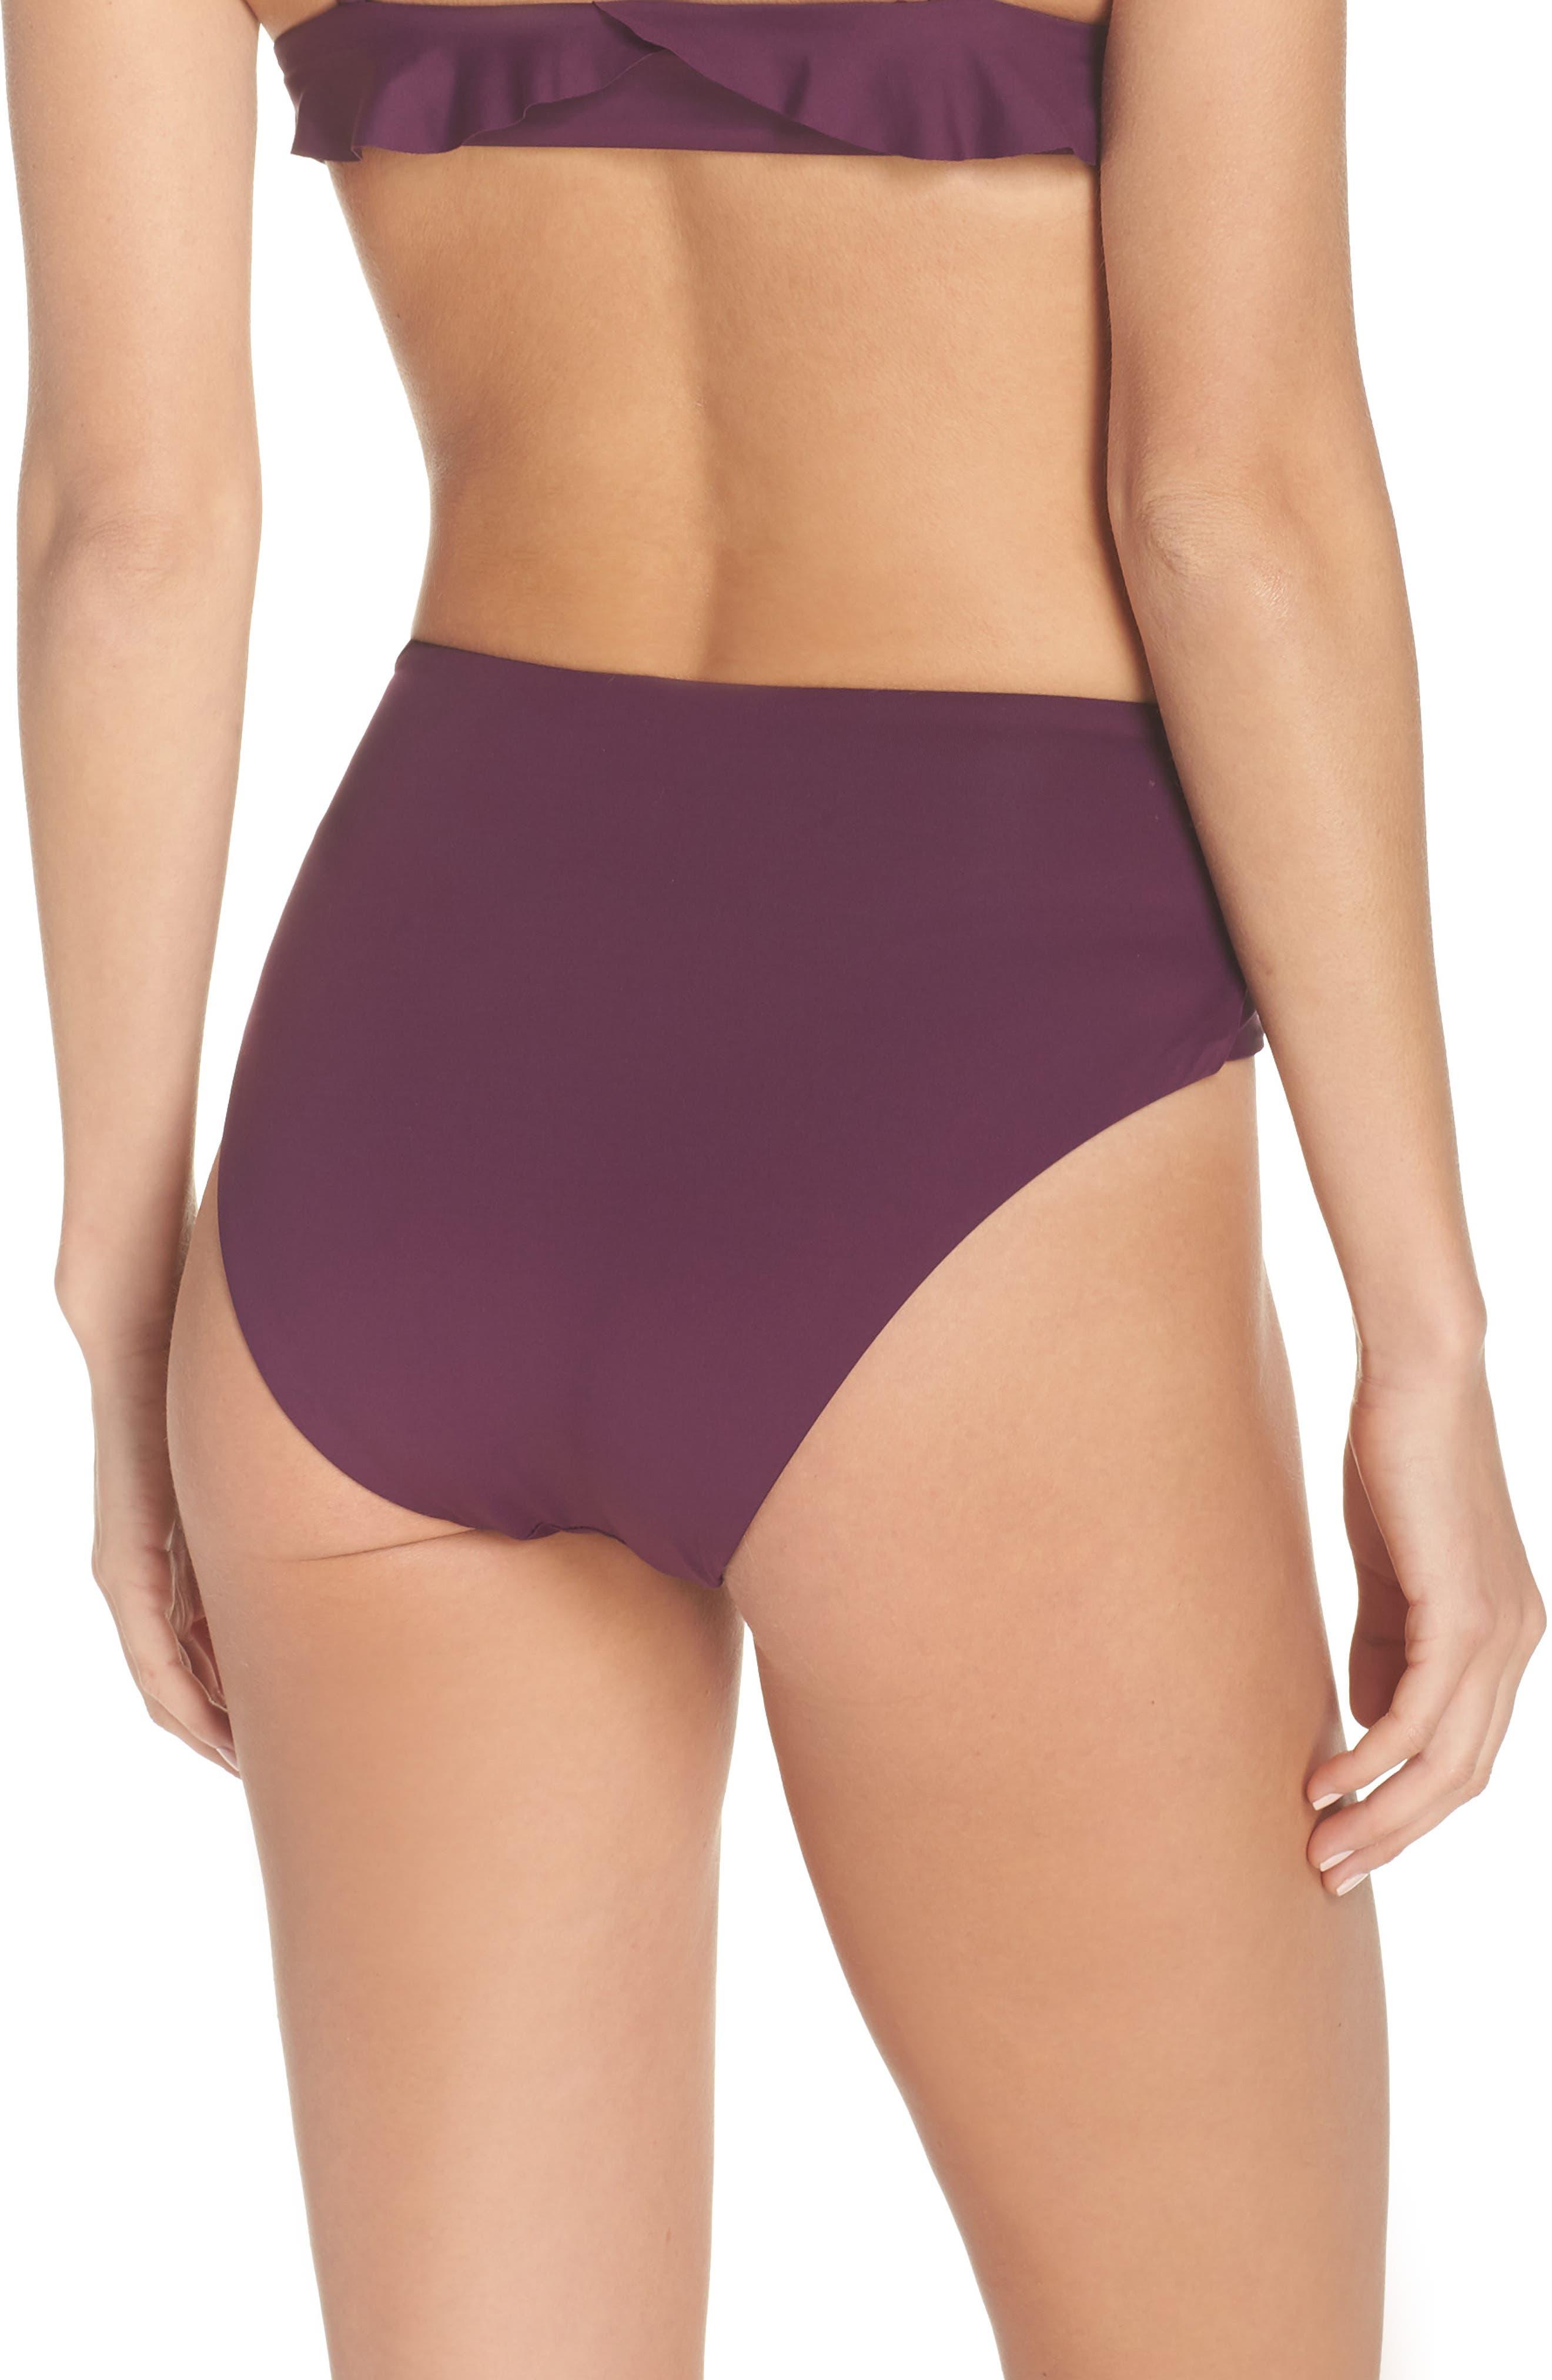 BECCA, Color Code Crossover High Waist Bikini Bottoms, Alternate thumbnail 2, color, MERLOT